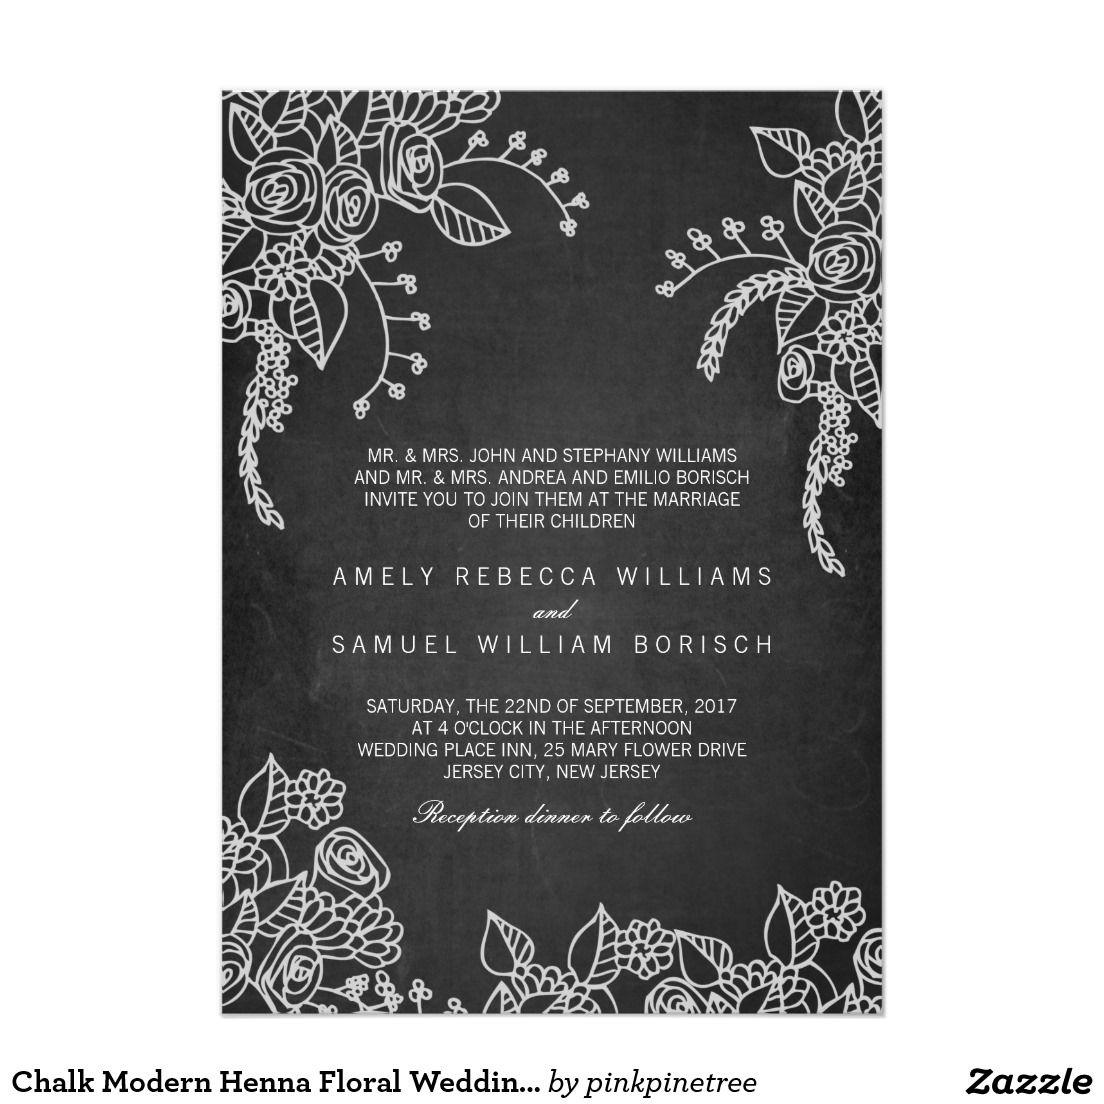 372b2f8d1711 Chalk Modern Henna Floral Wedding Invitation